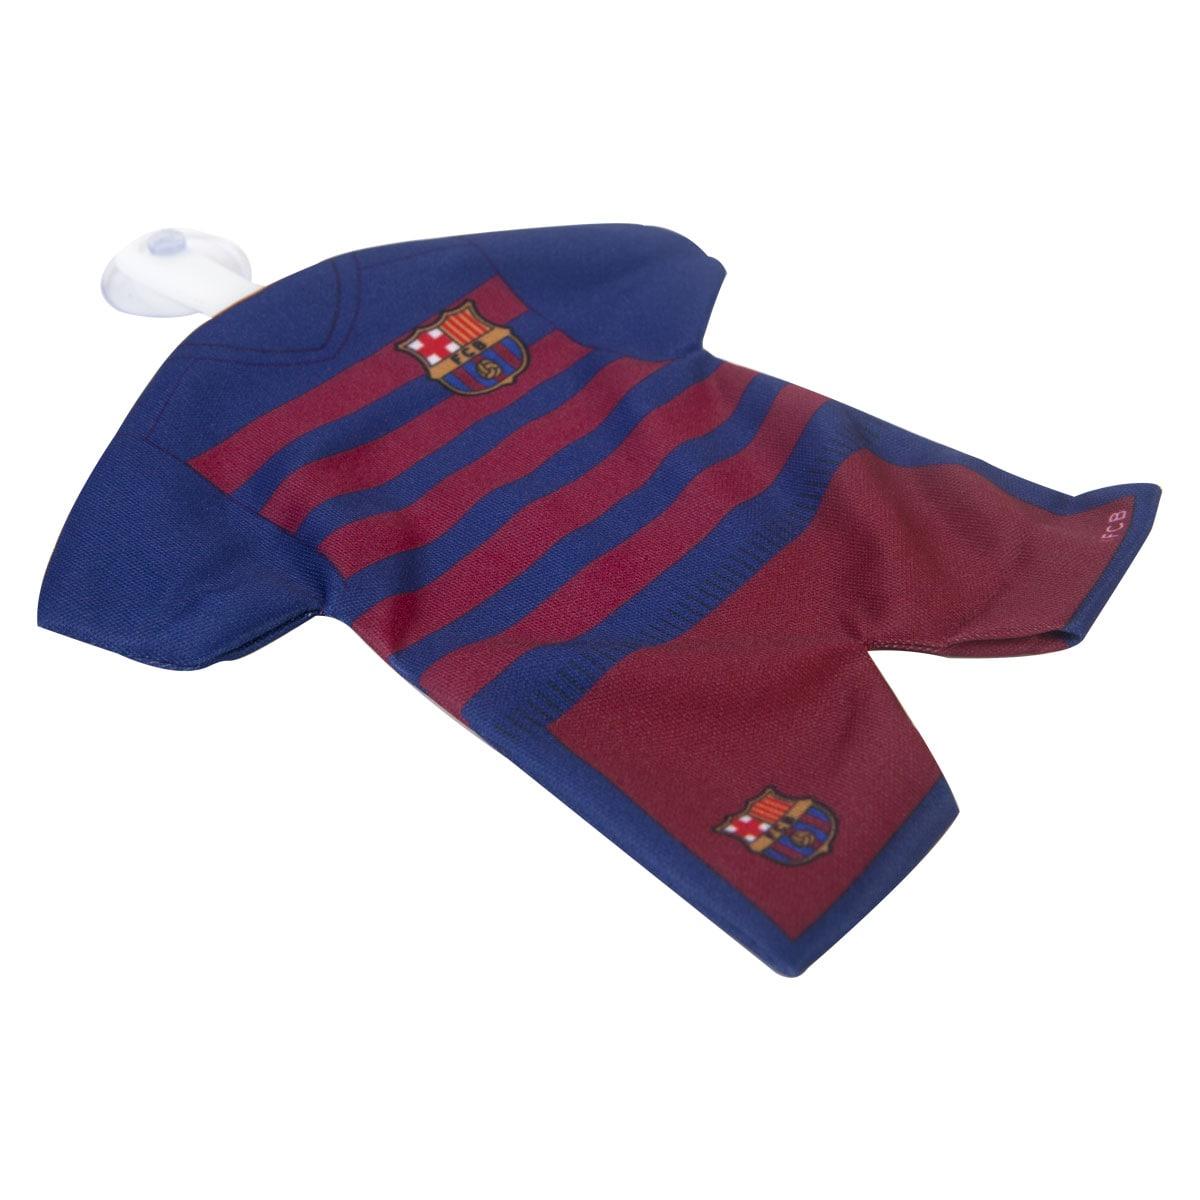 F.C. Barcelona Mini Kit - 1